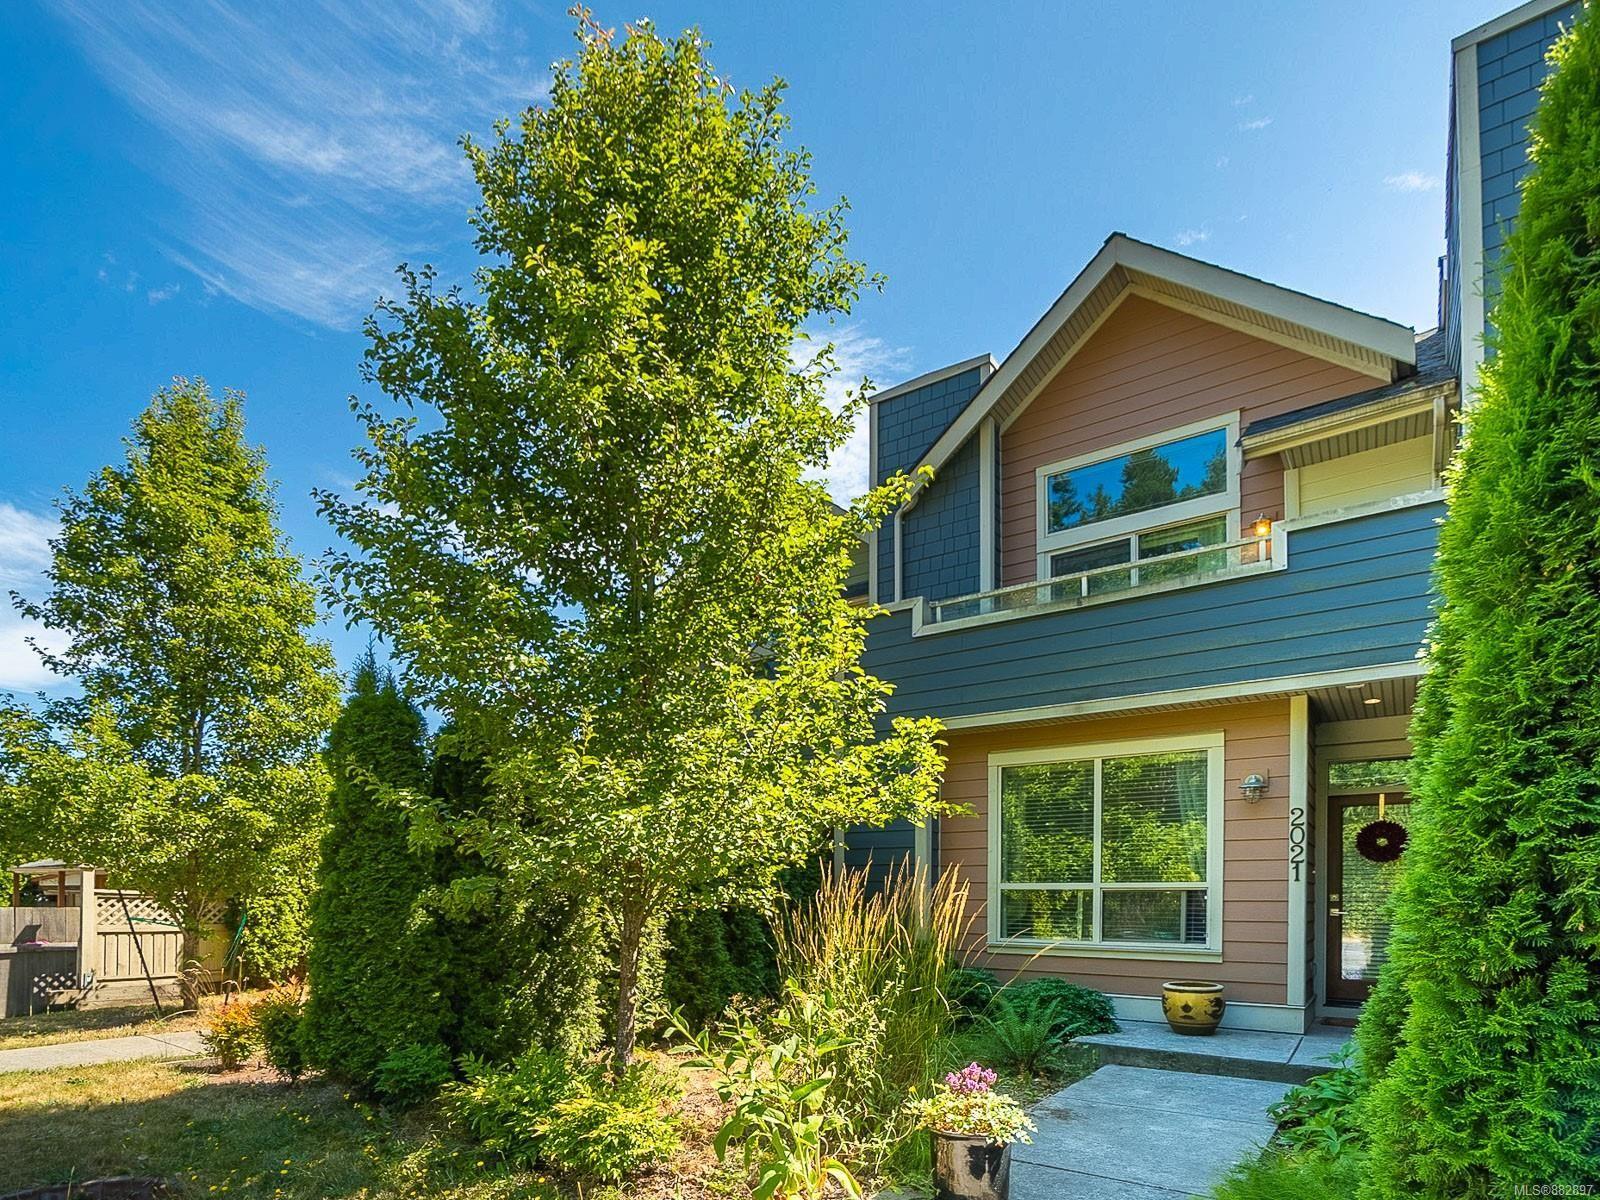 Main Photo: 2021 Northfield Rd in Nanaimo: Na Central Nanaimo House for sale : MLS®# 882897